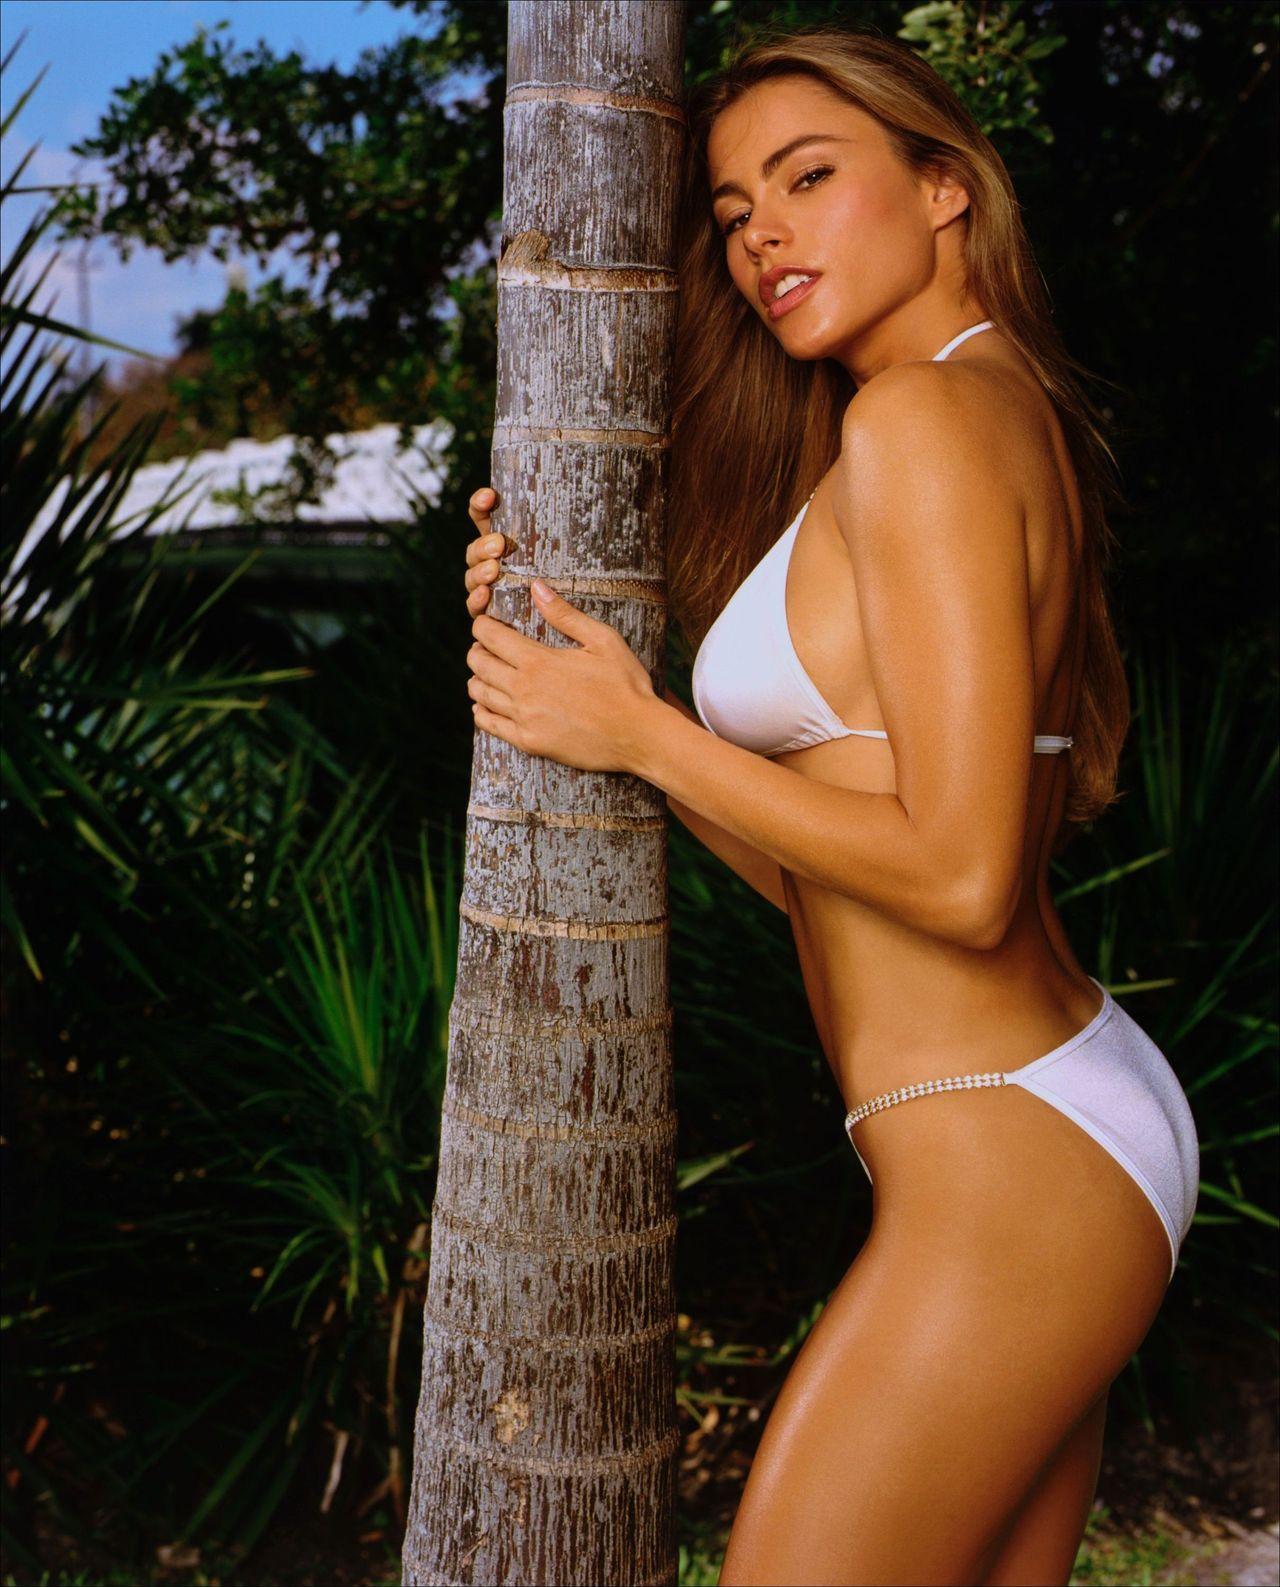 0c52cdf0ed1 Sofia Vergara en bikini = fap accepted | Jack Sophia v | Sofia ...